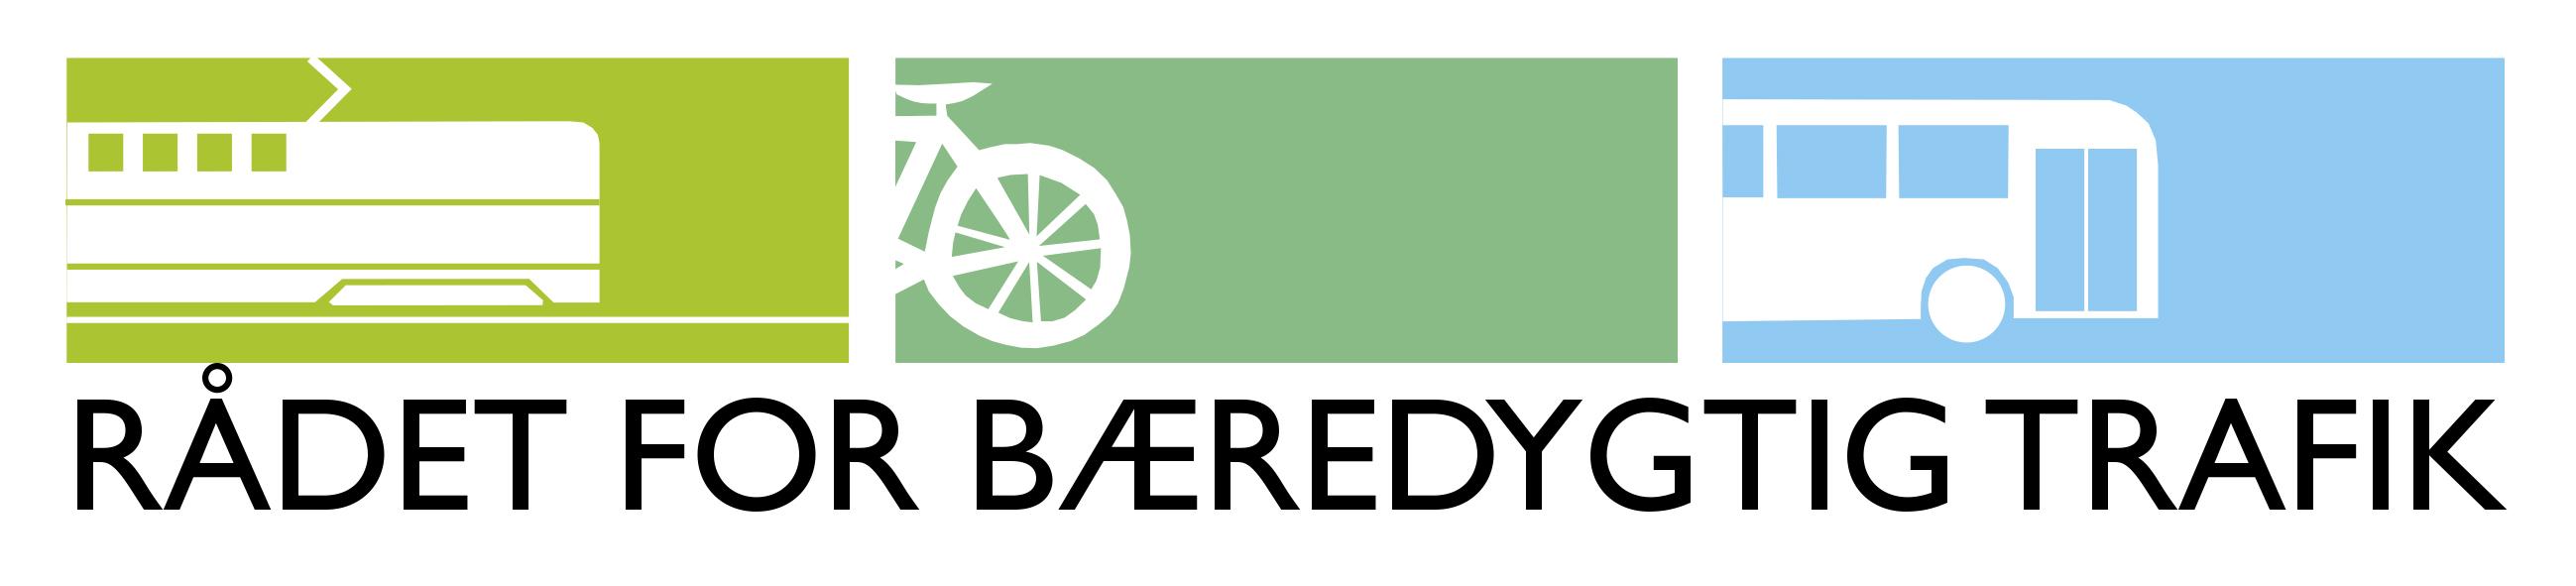 Radet_for_Baeredygtig_Trafik_logo_stort